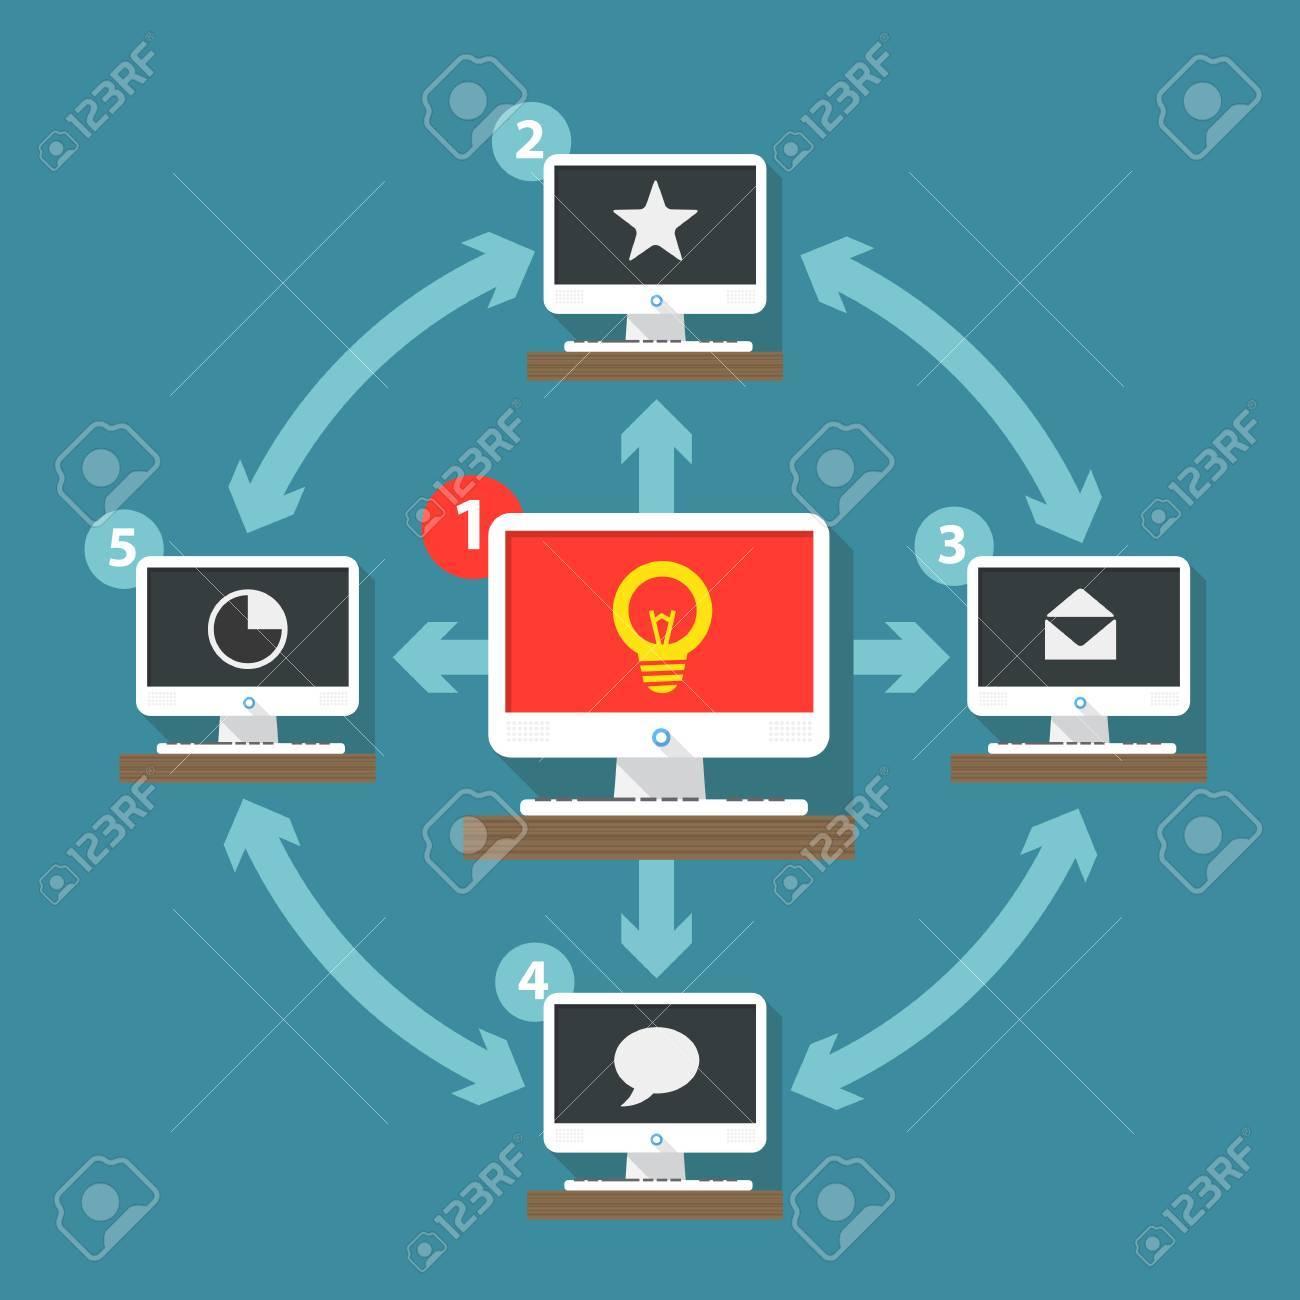 Abstract computer network scheme Stock Vector - 25273741